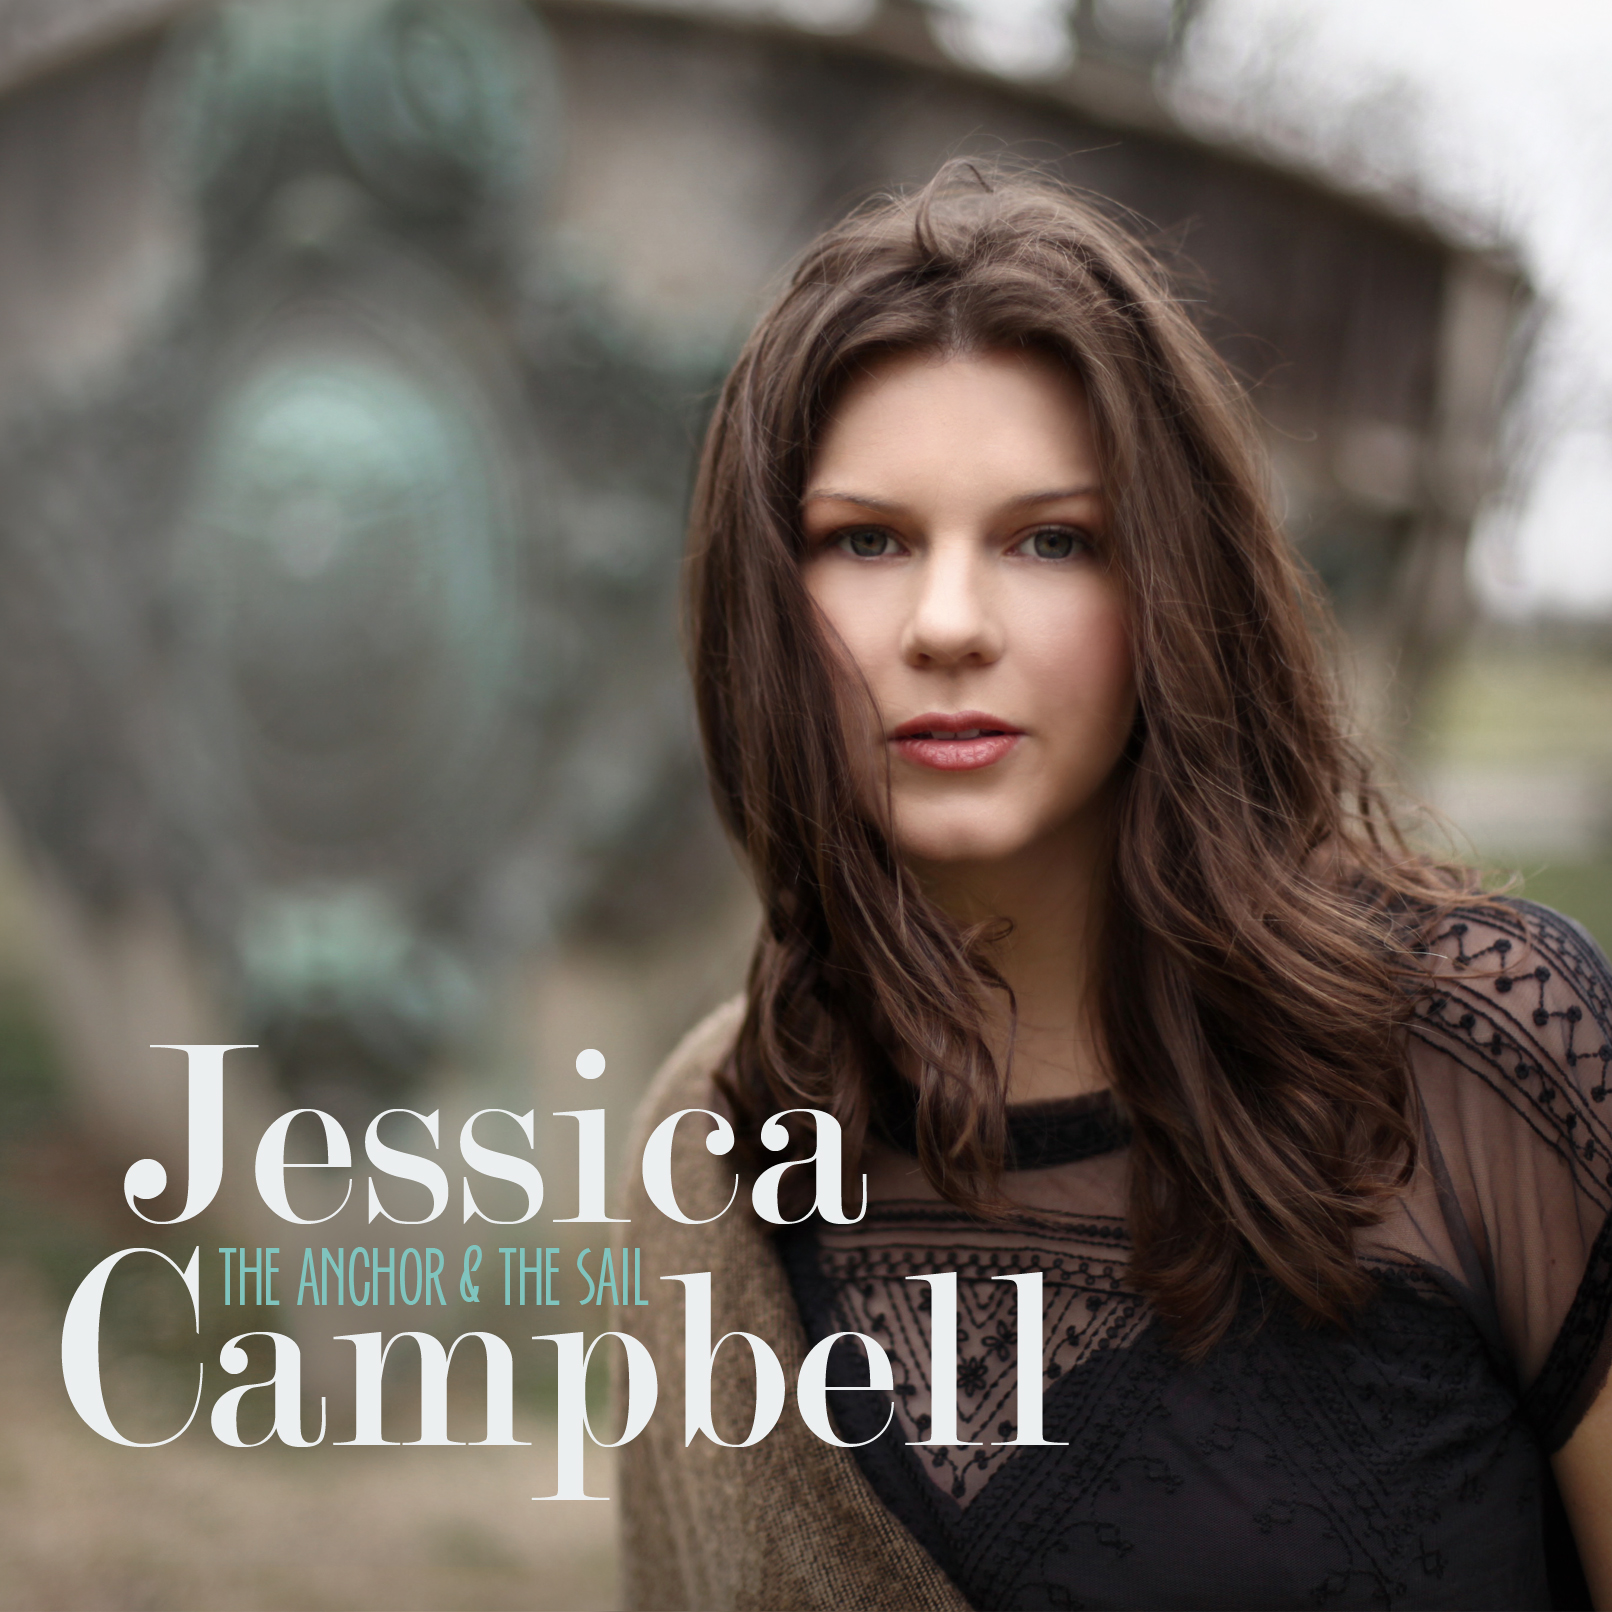 Jessica Campbell nude (14 photo), Sexy, Bikini, Feet, legs 2019